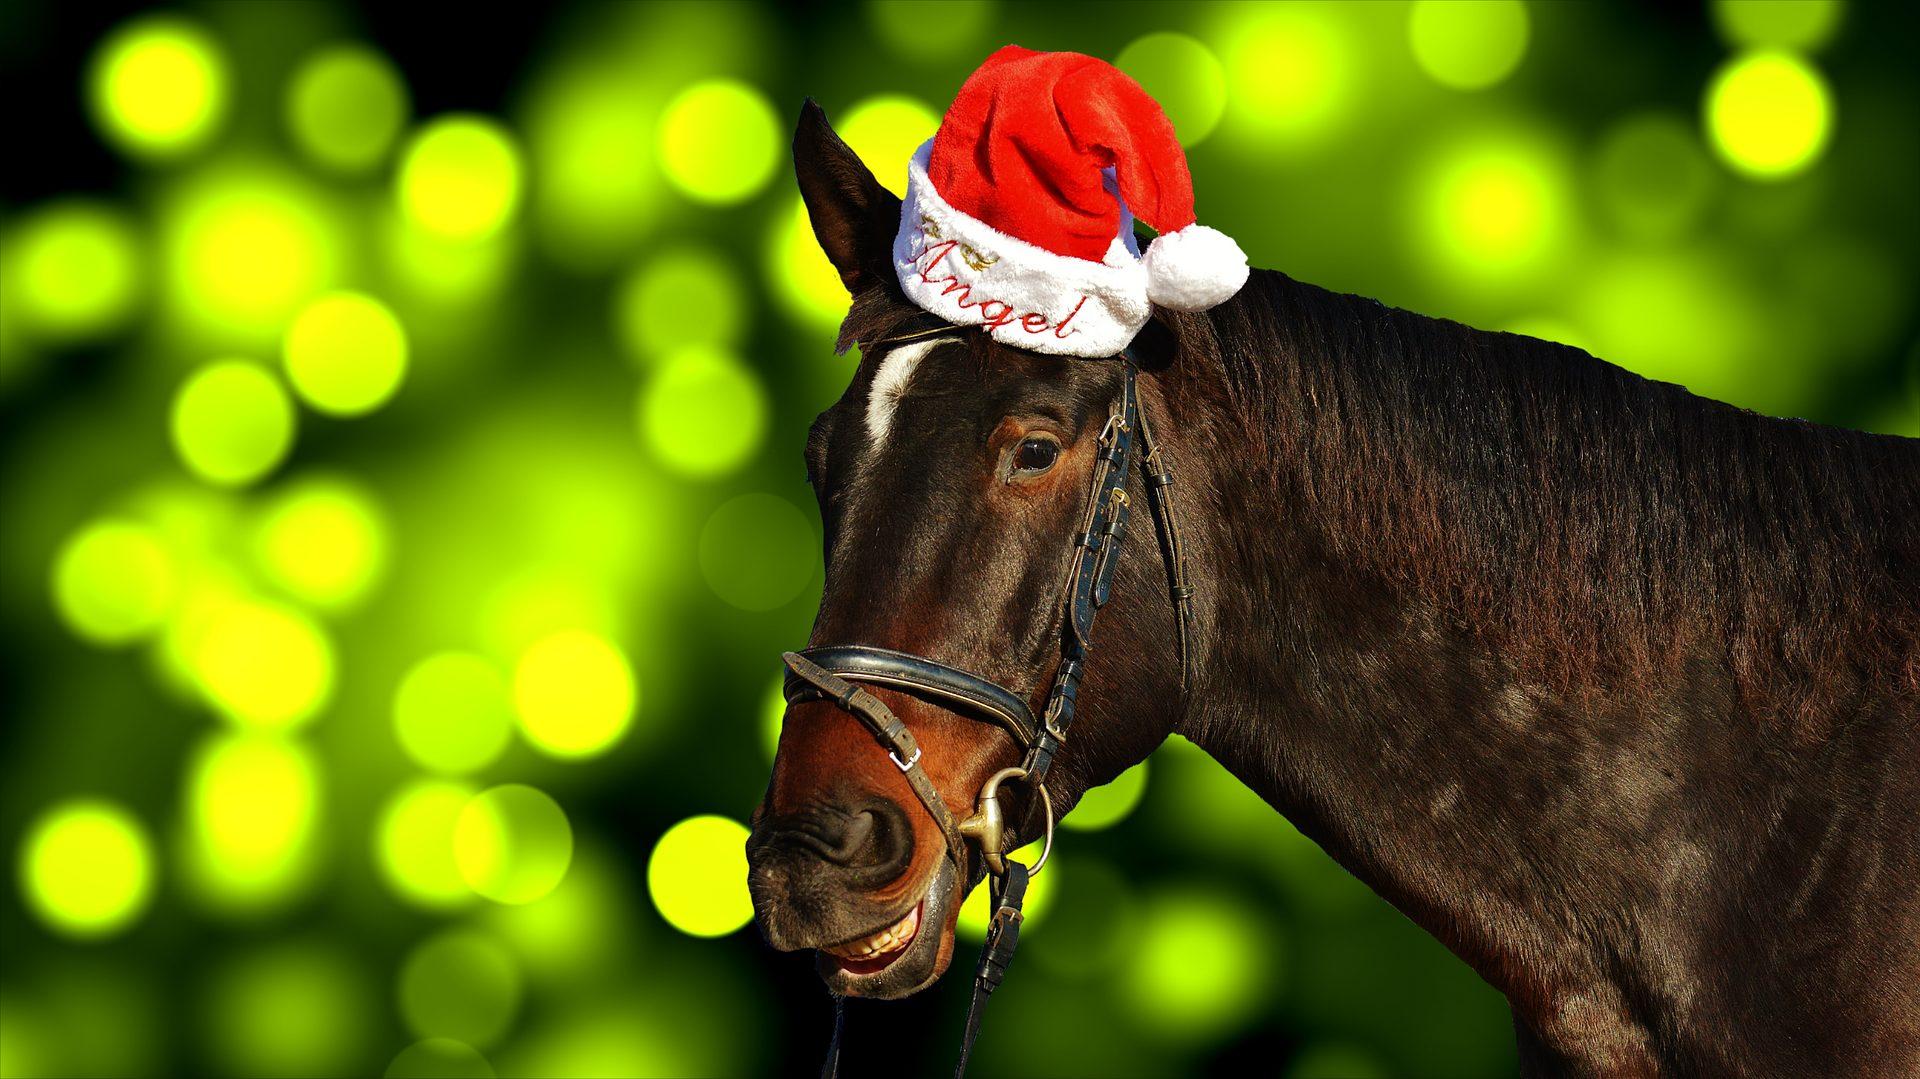 Cute Christmas Horse Wallpaper With Santa Cap Free Horse With Santa Hat 1920x1079 Wallpaper Teahub Io